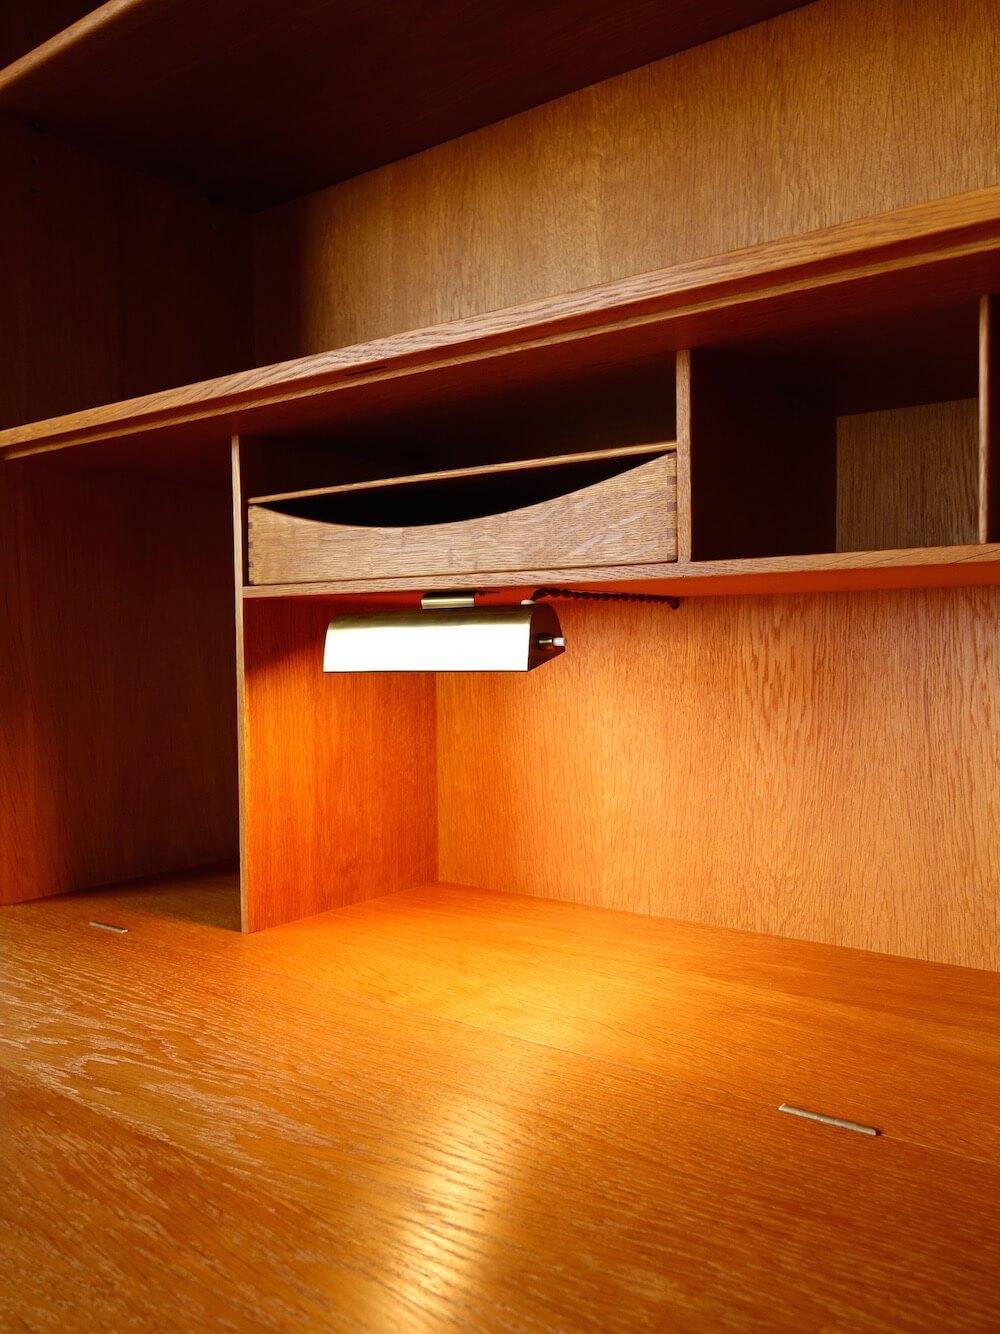 RY series writing cabinet by Hans J. Wegner in oak